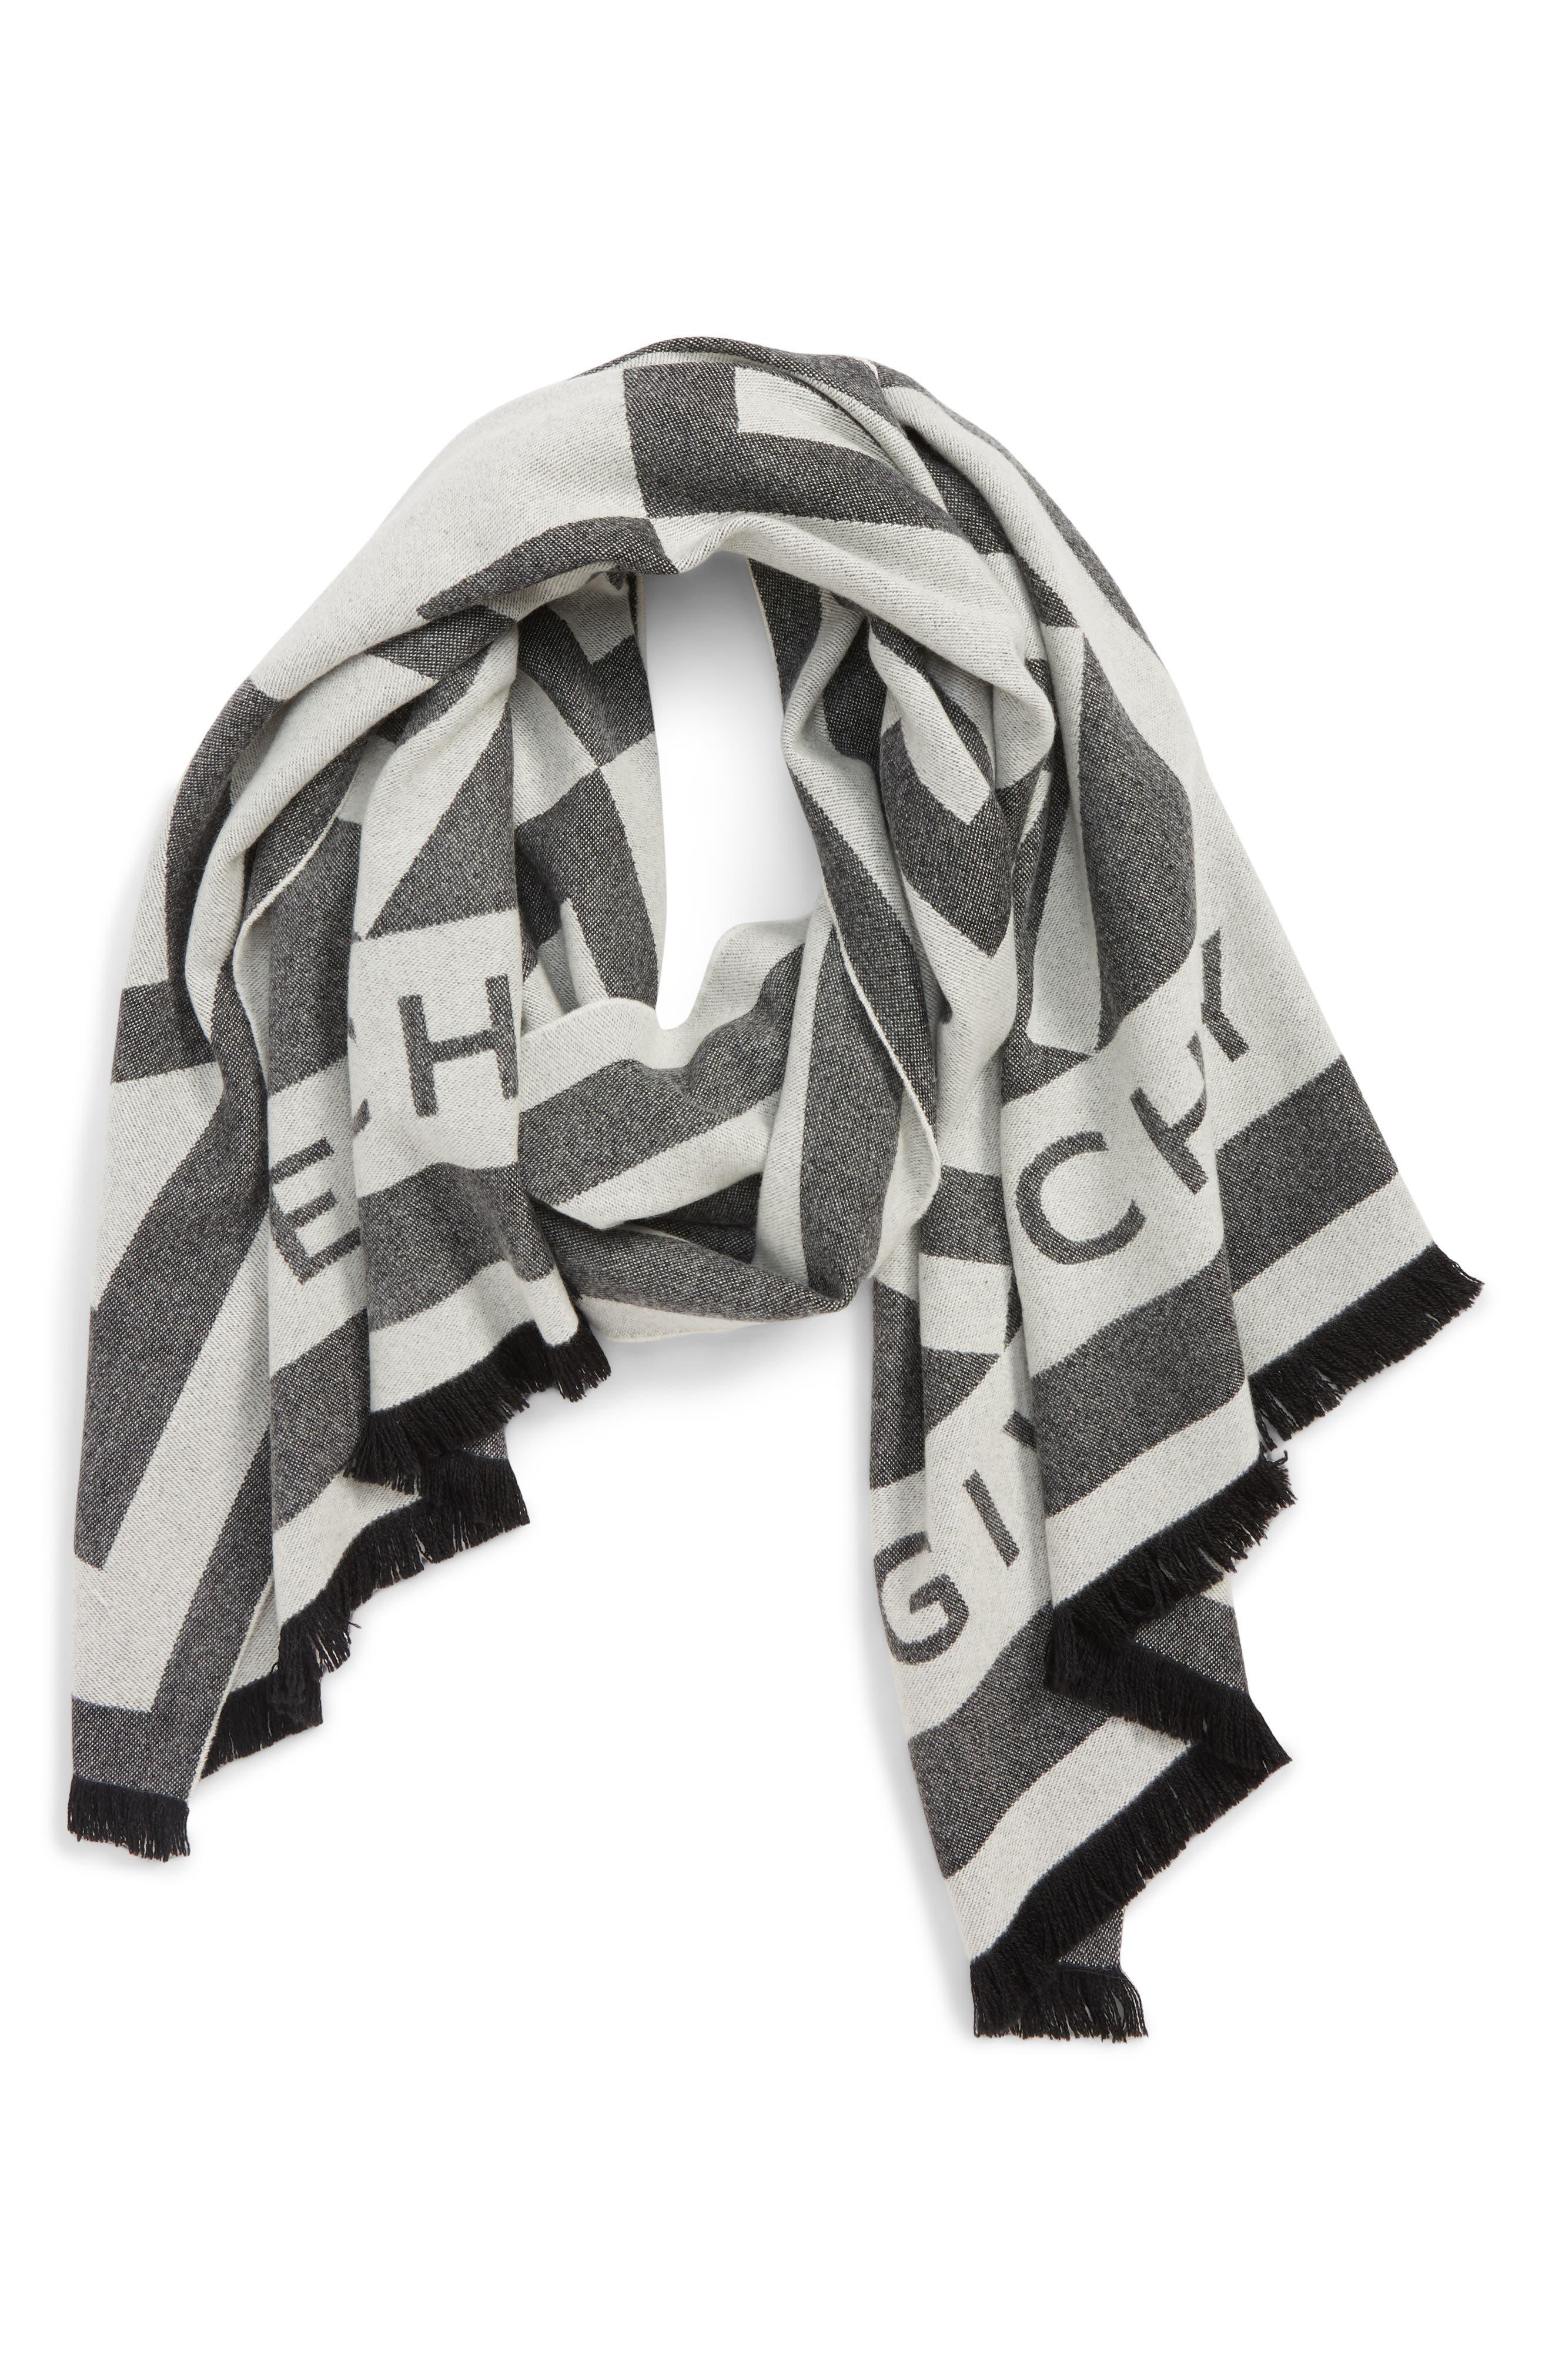 GIVENCHY Nouveau G Wool & Cashmere Scarf, Main, color, BLACK/ WHITE